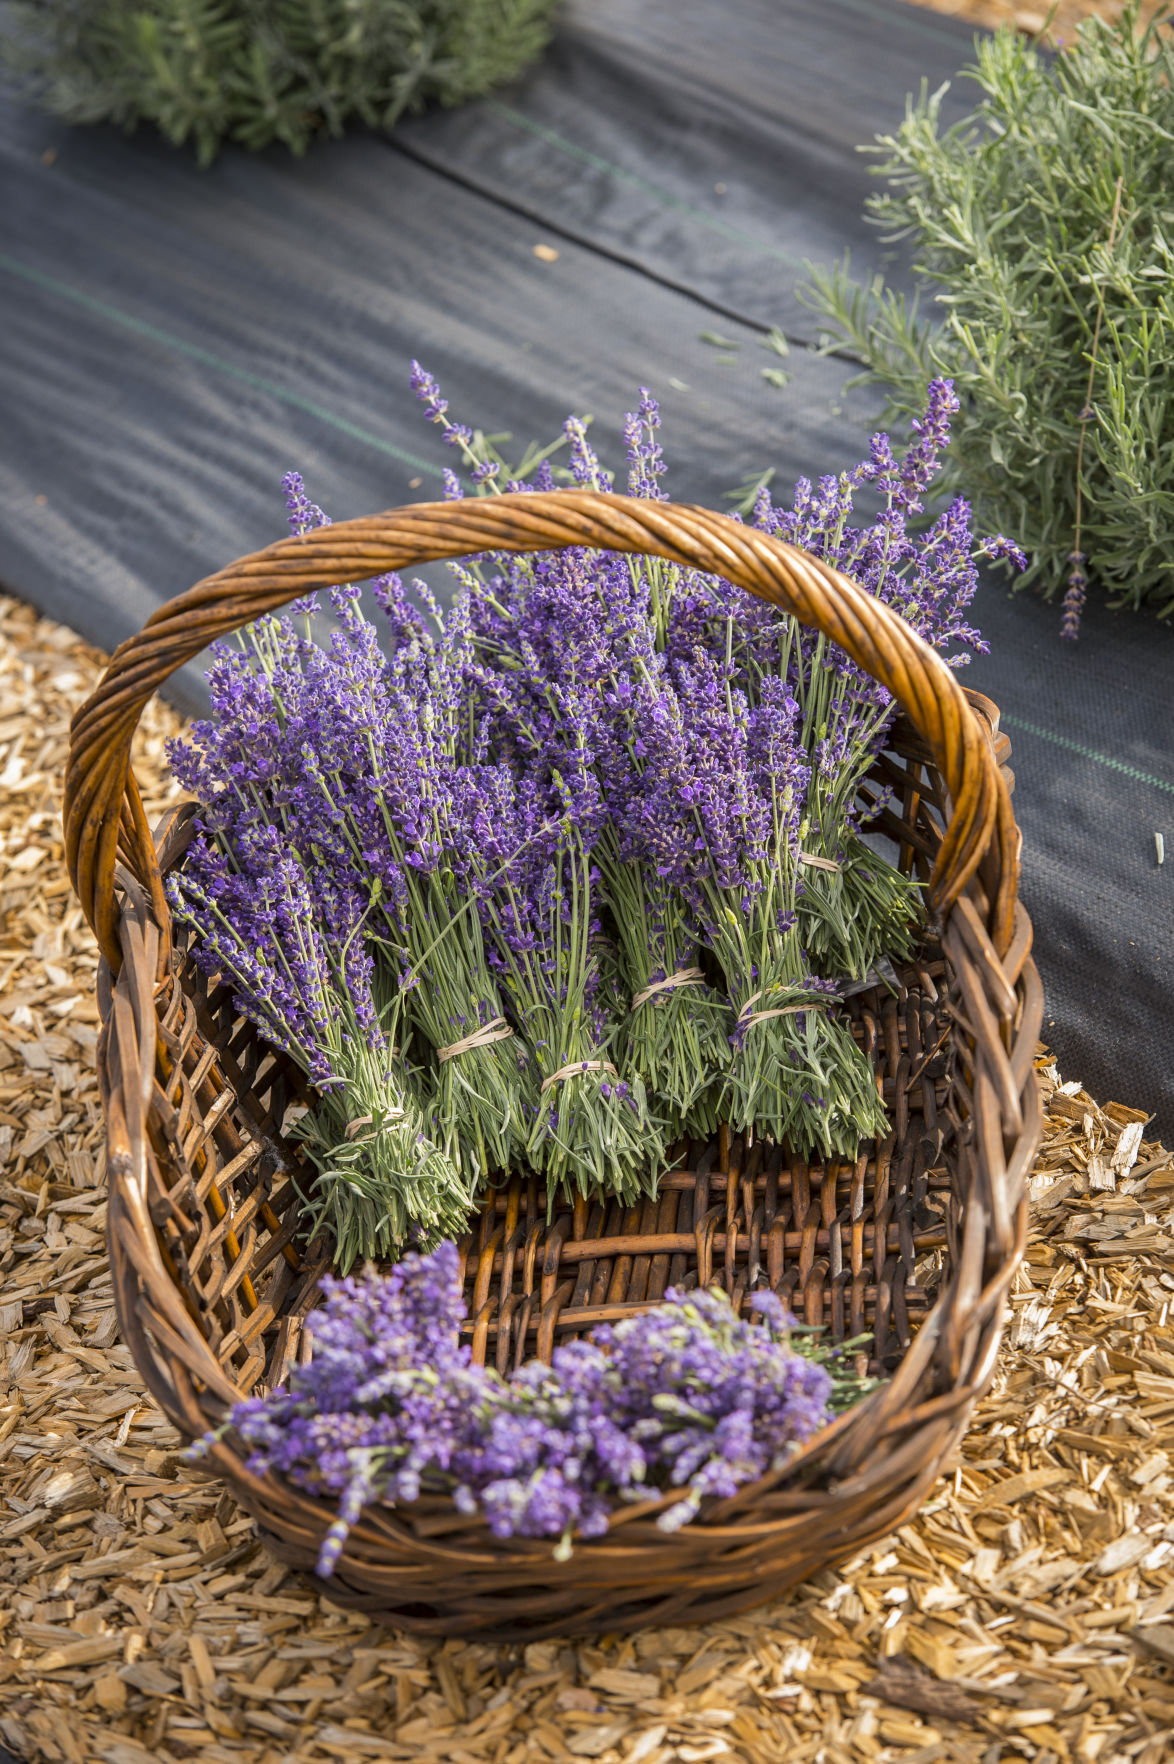 071819-lavender 3.jpg